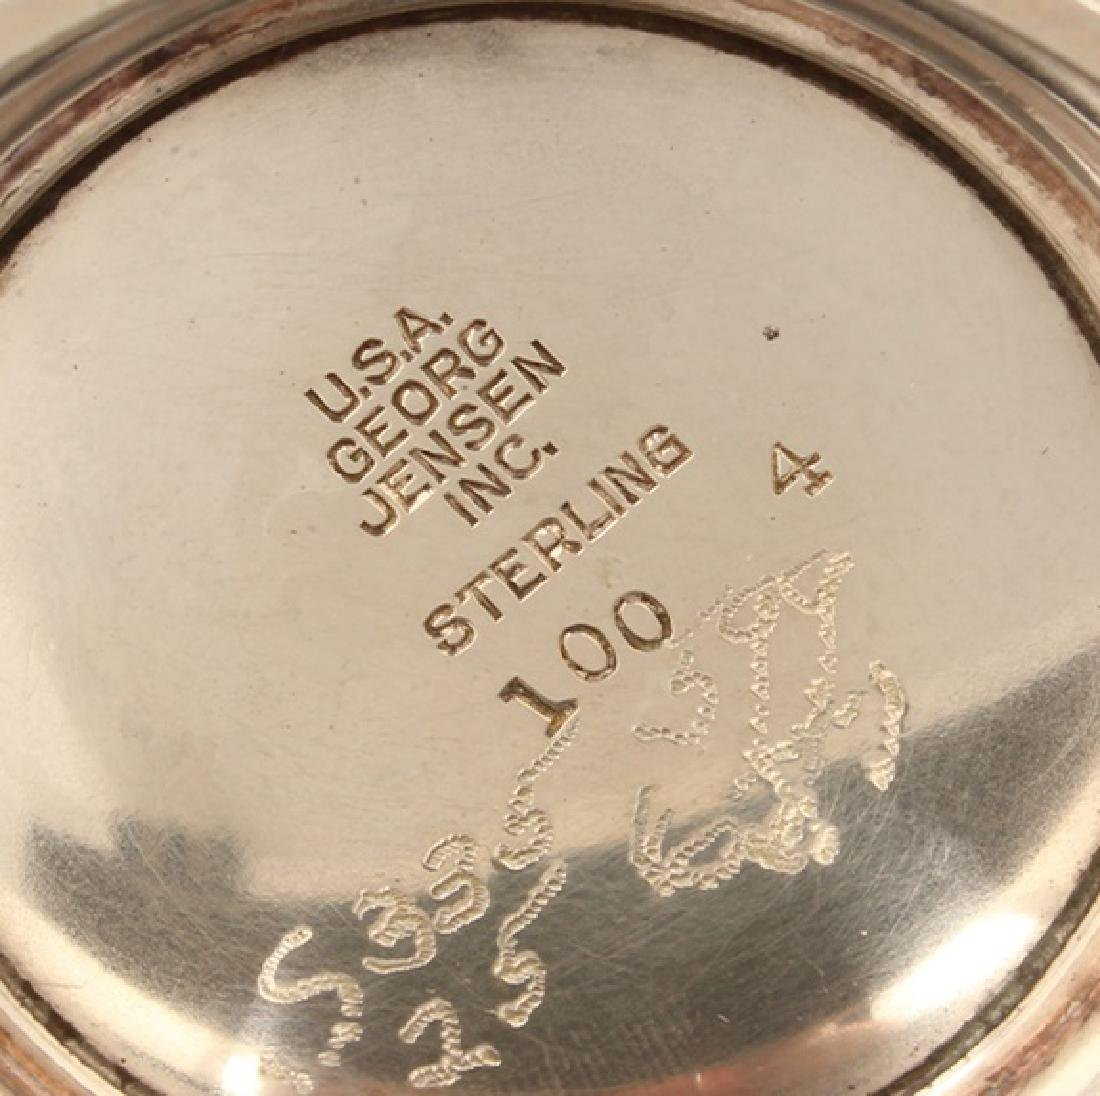 STERLING SILVER GEORG JENSEN INC. REVERE BOWL U.S.A. - 3